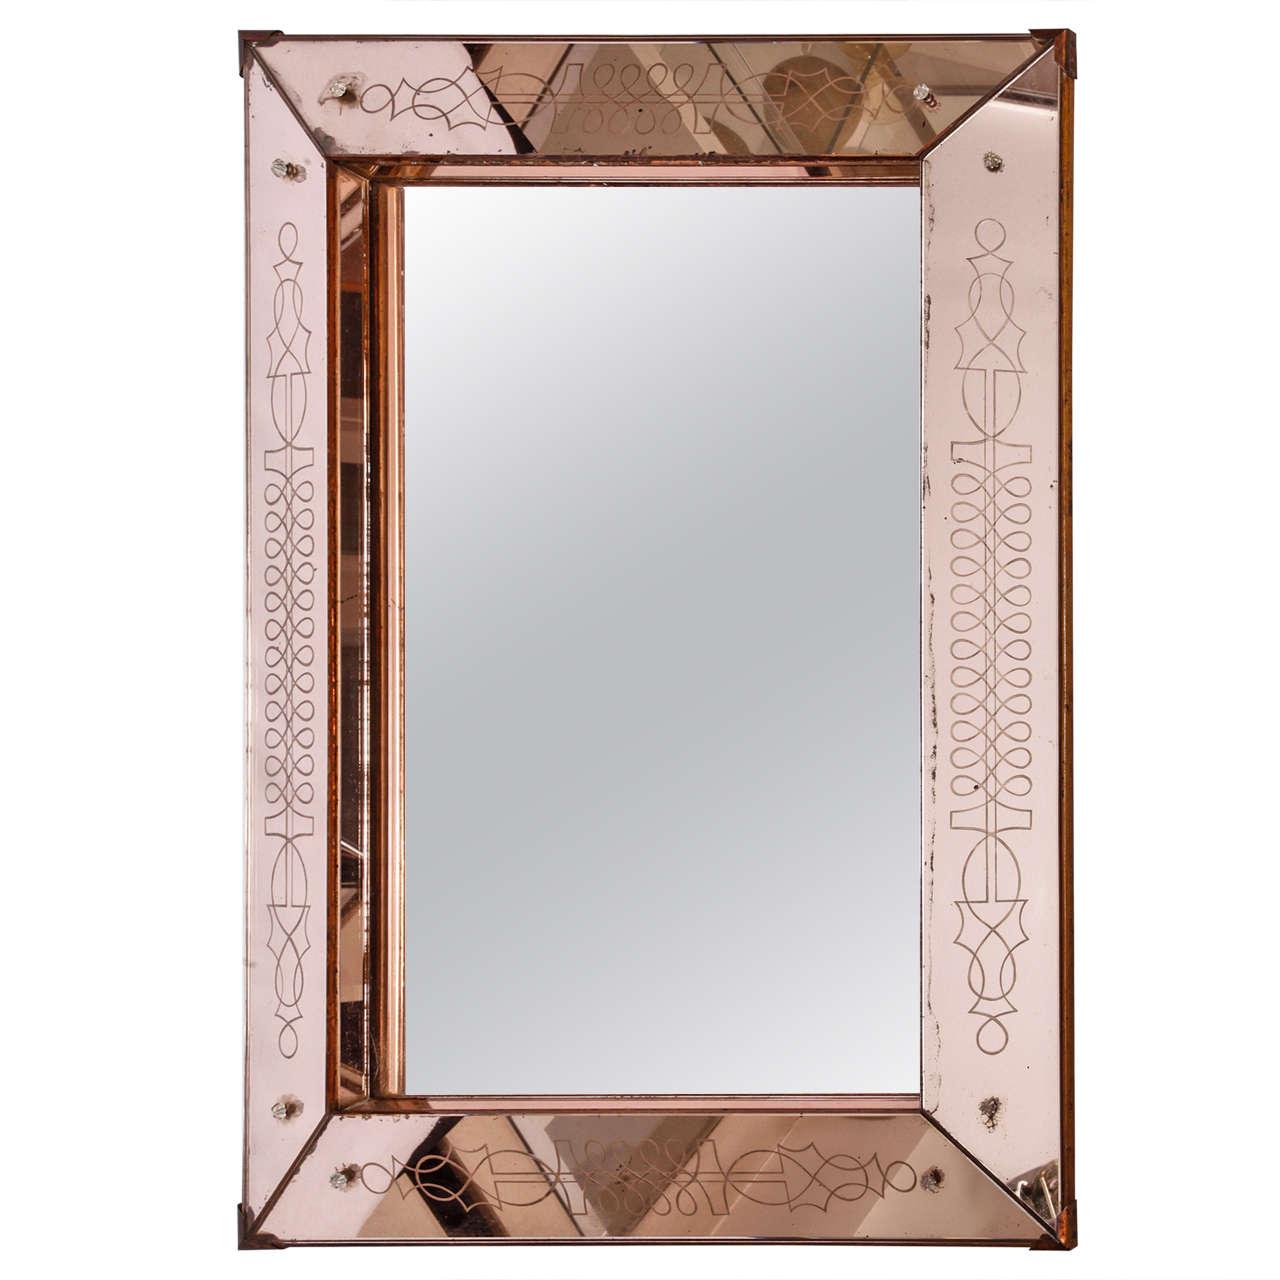 Hammered Metal Mirror Designs